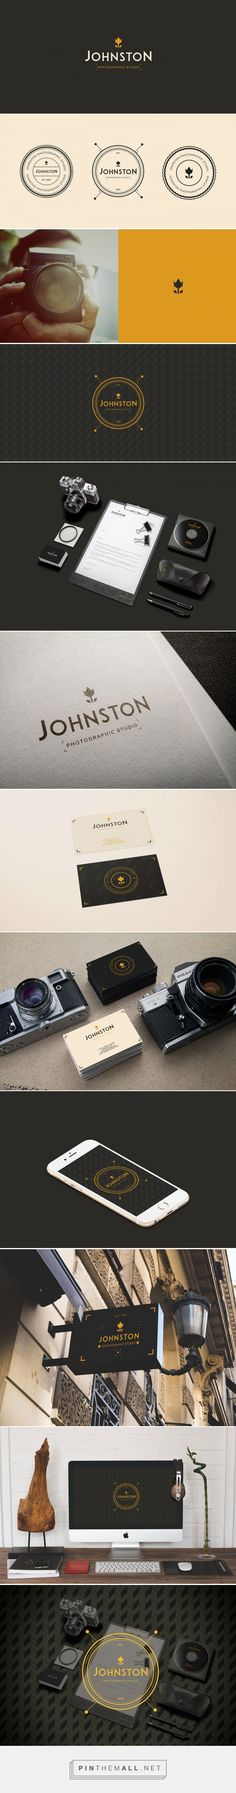 Johnston - Photographic Studio - Brand Identity by Martín Liveratore